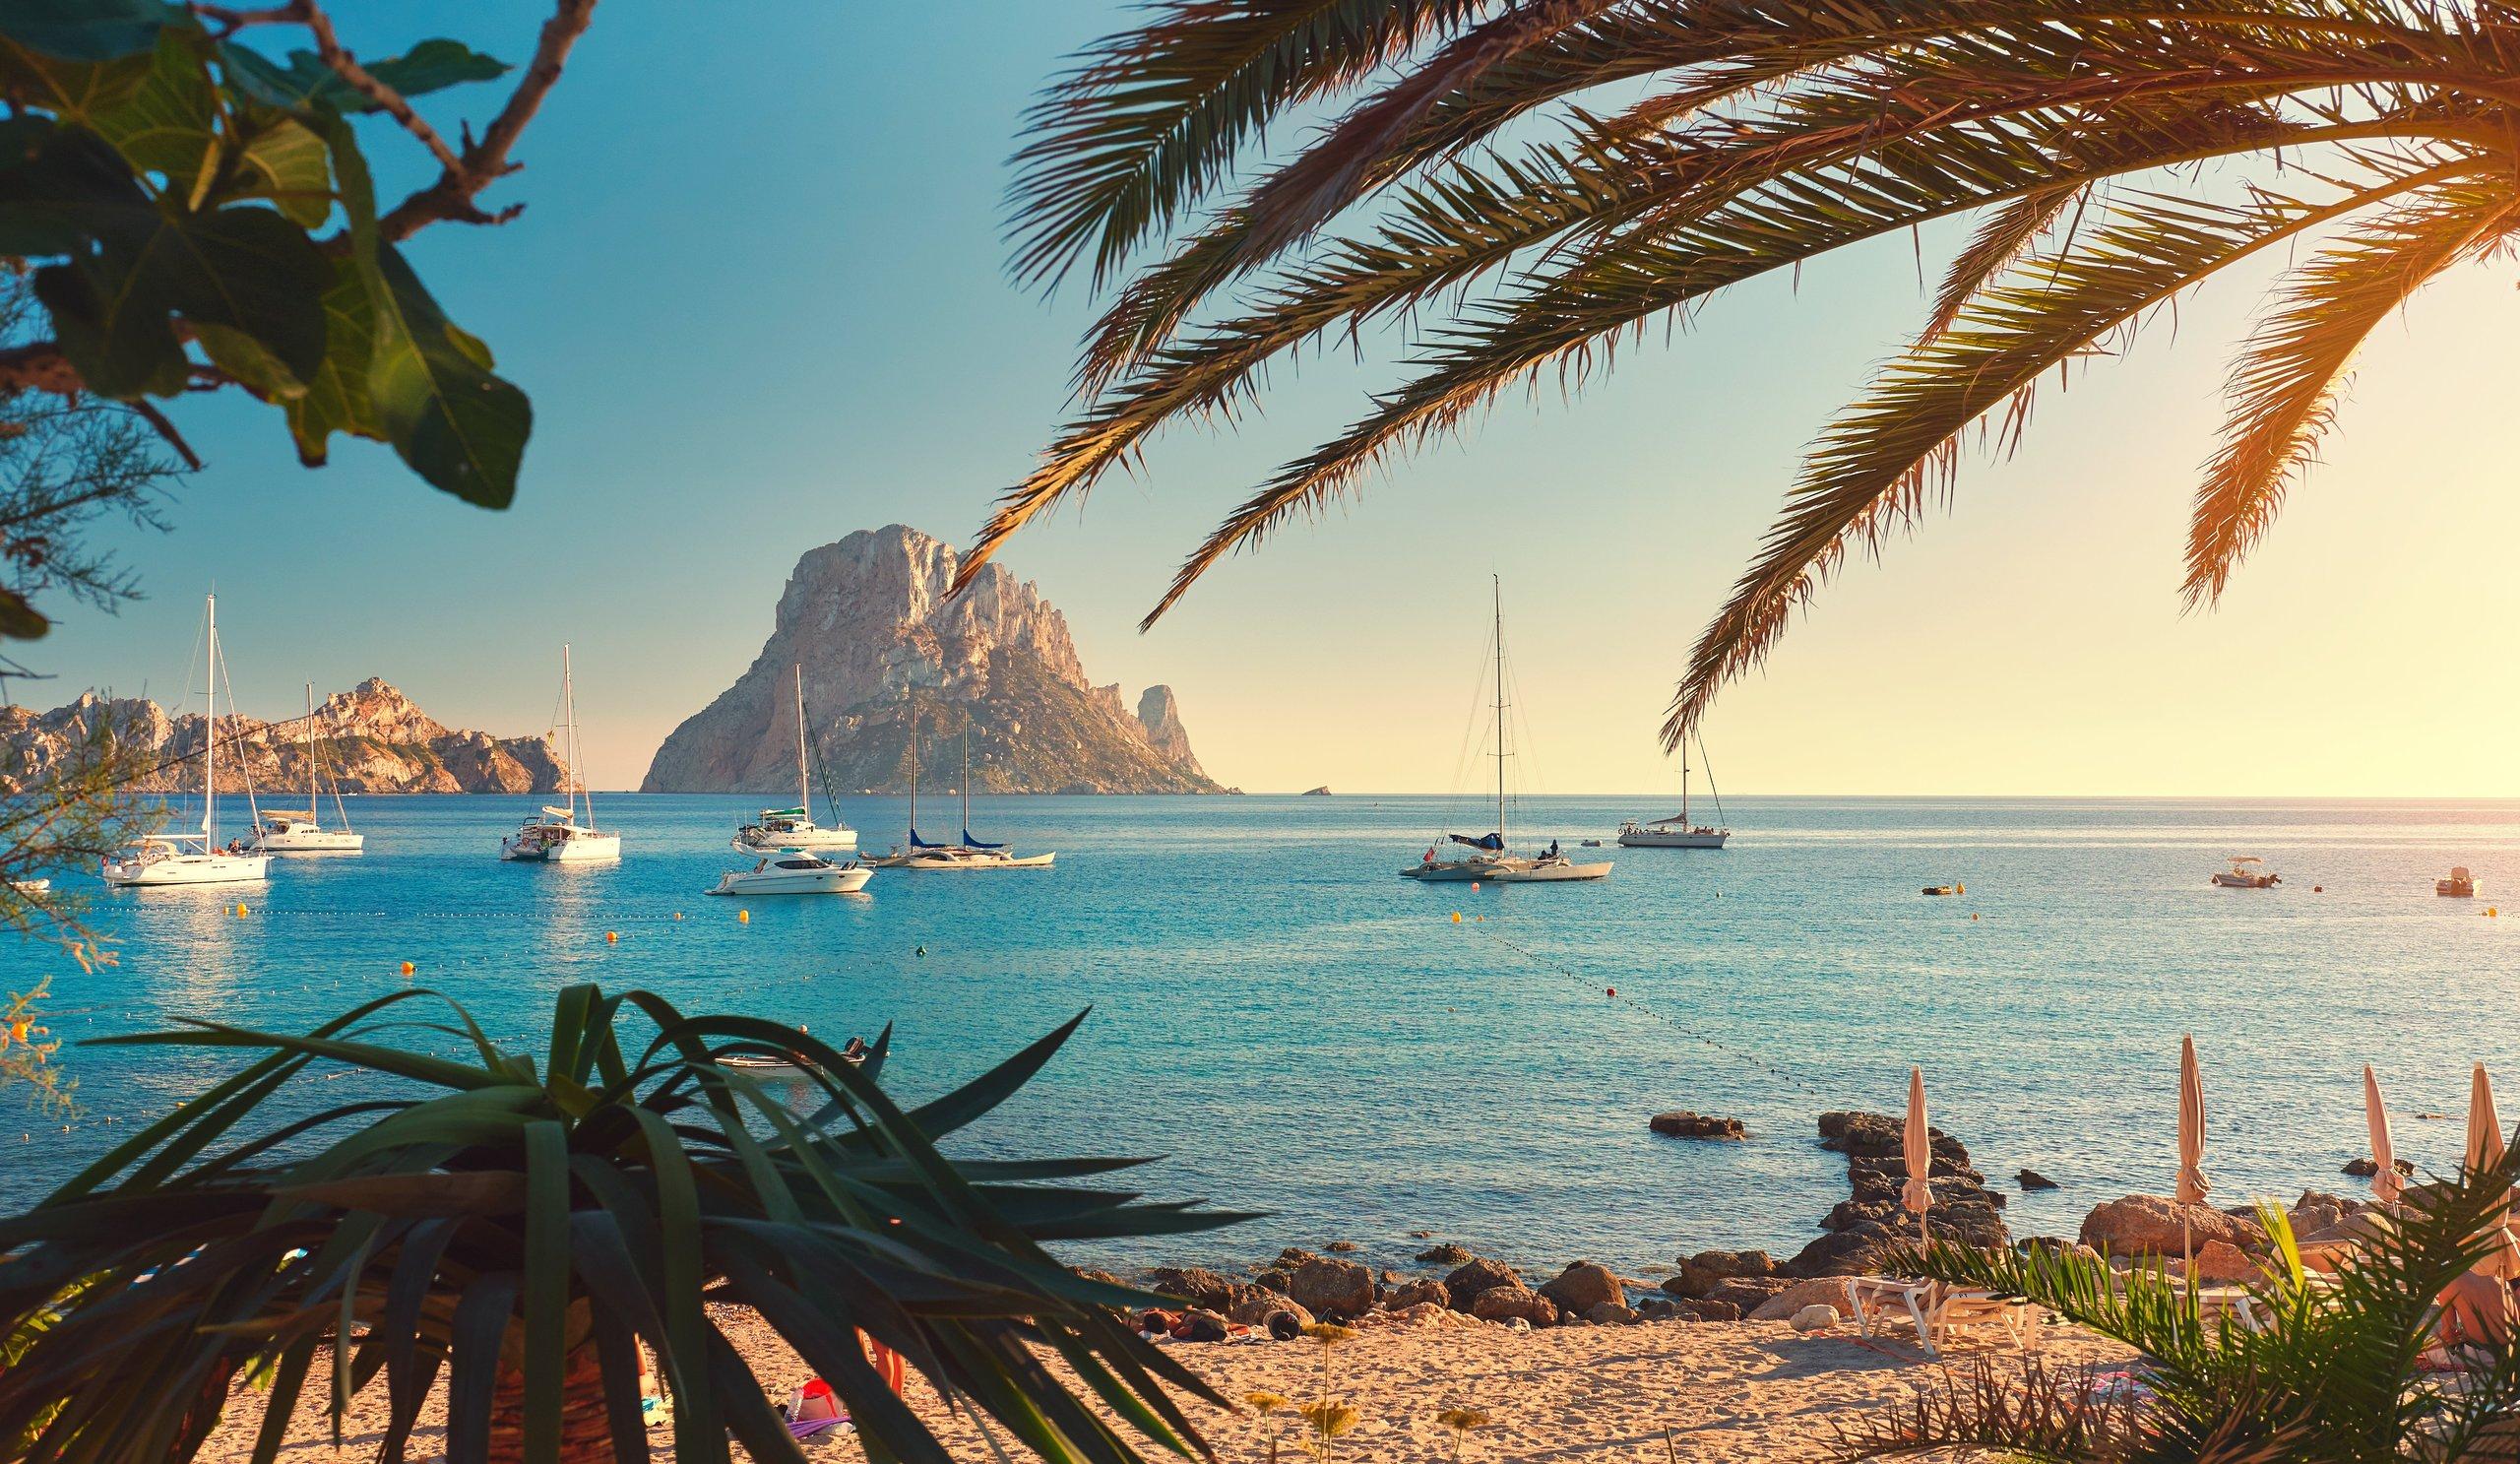 Viaje a las Islas Baleares